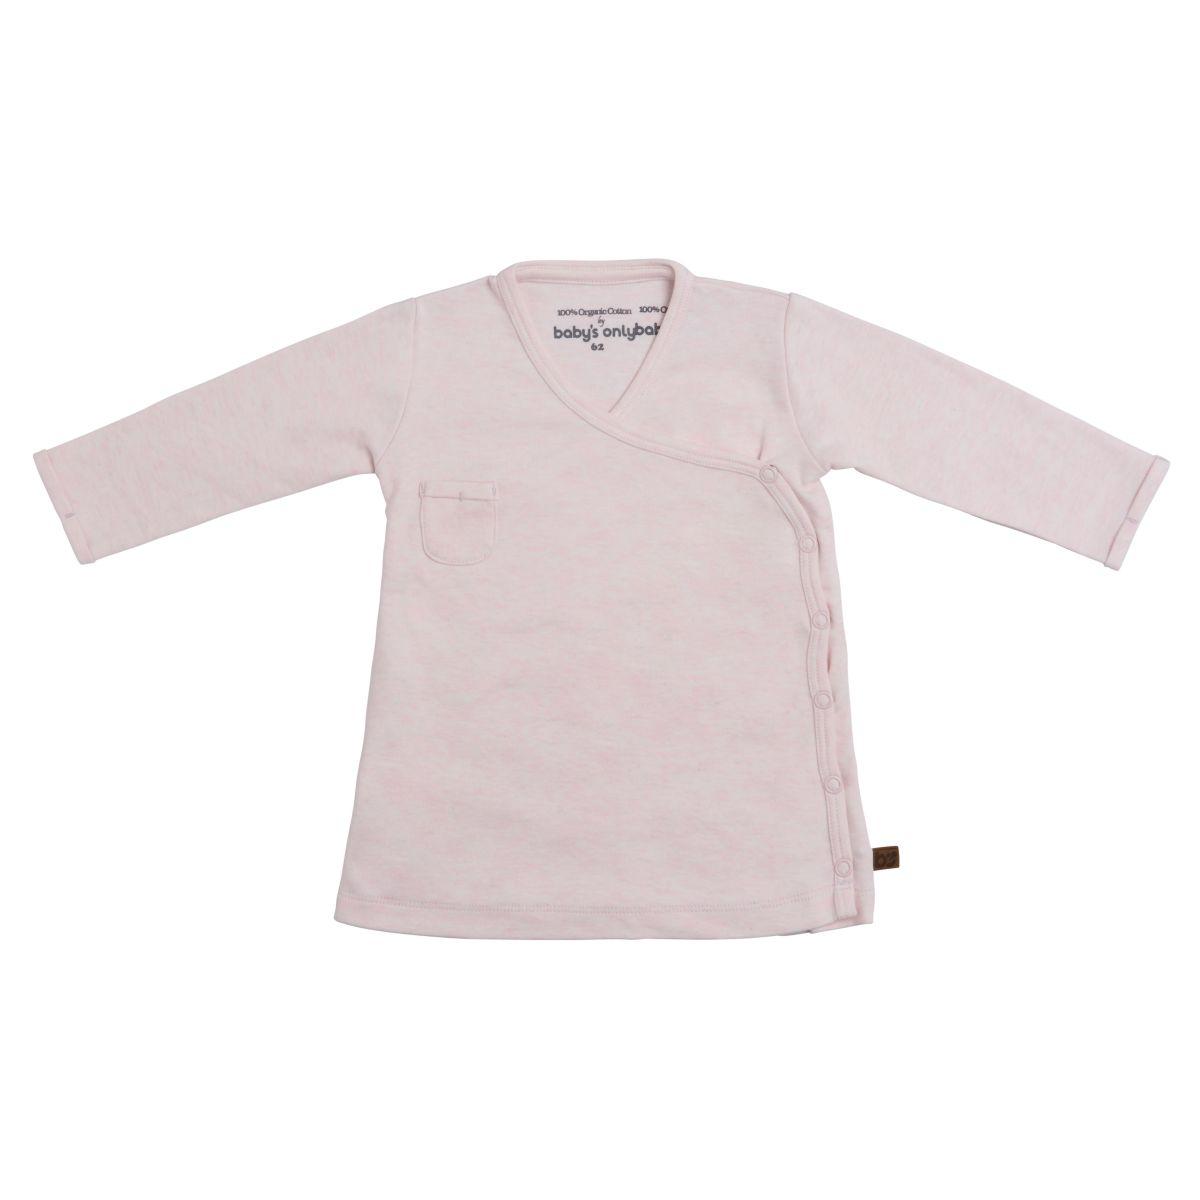 babys only 3506801 jurkje melange 68 classic roze 1